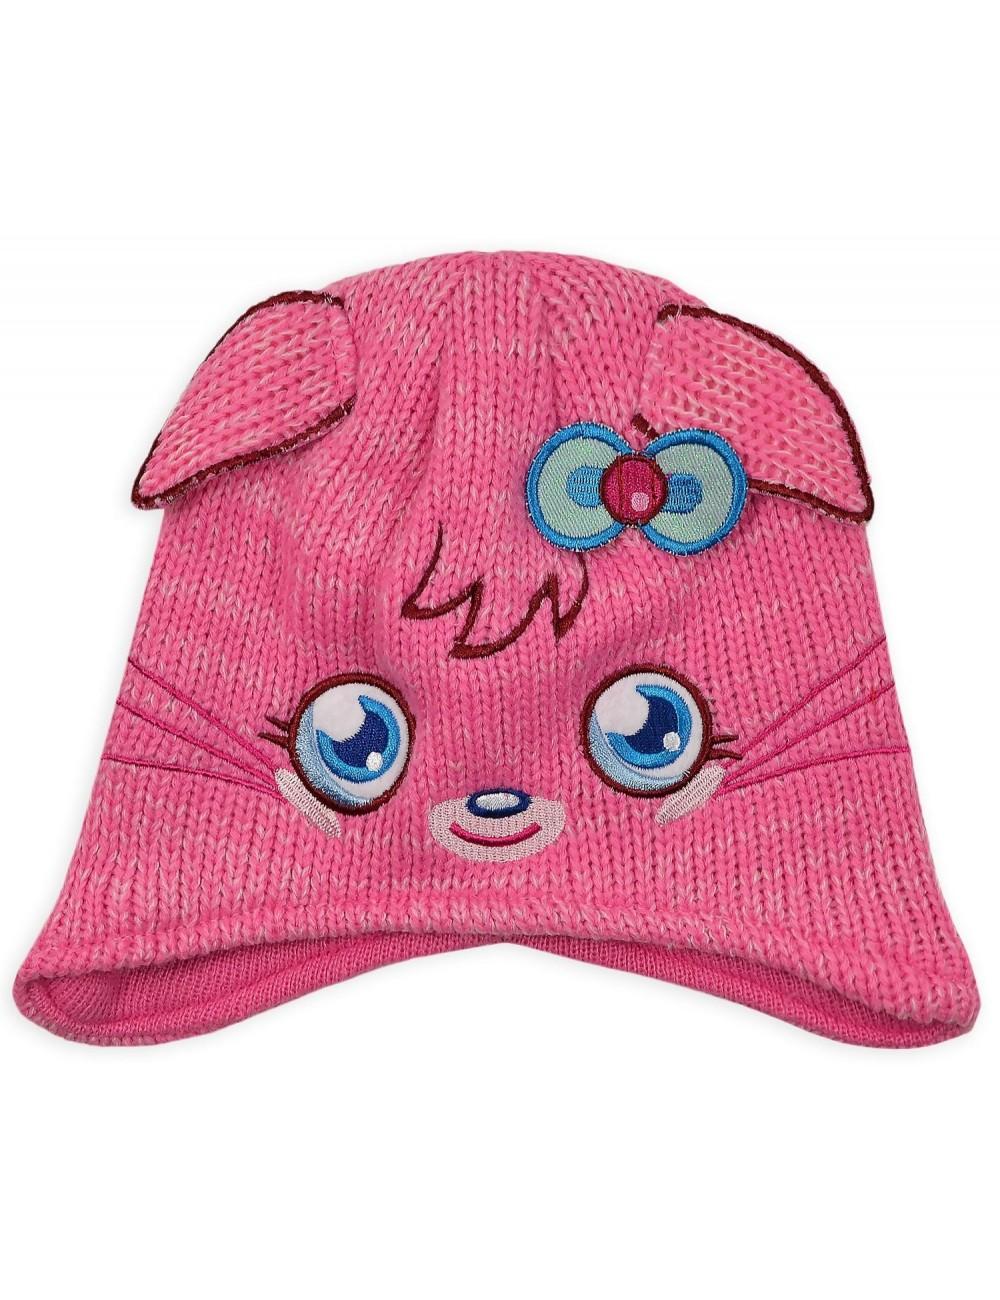 Caciula tricotata Poppet Moshi Monsters, 1-3 ani